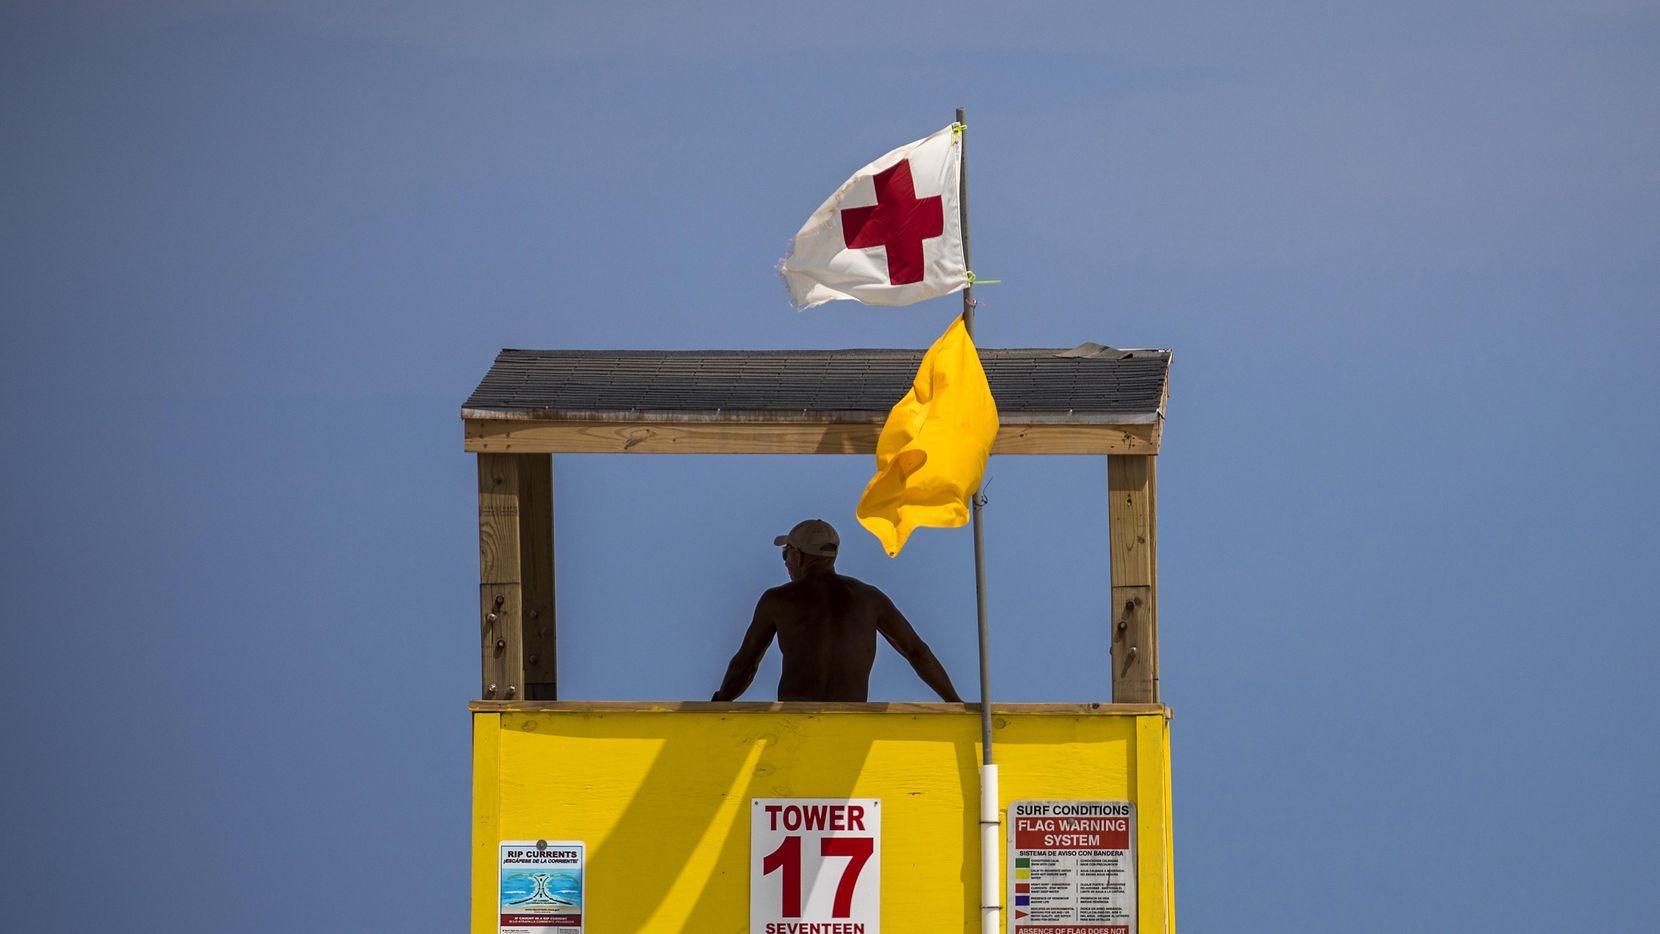 A Port Aransas Beach Guard looks out from a tower in Port Aransas, Texas.